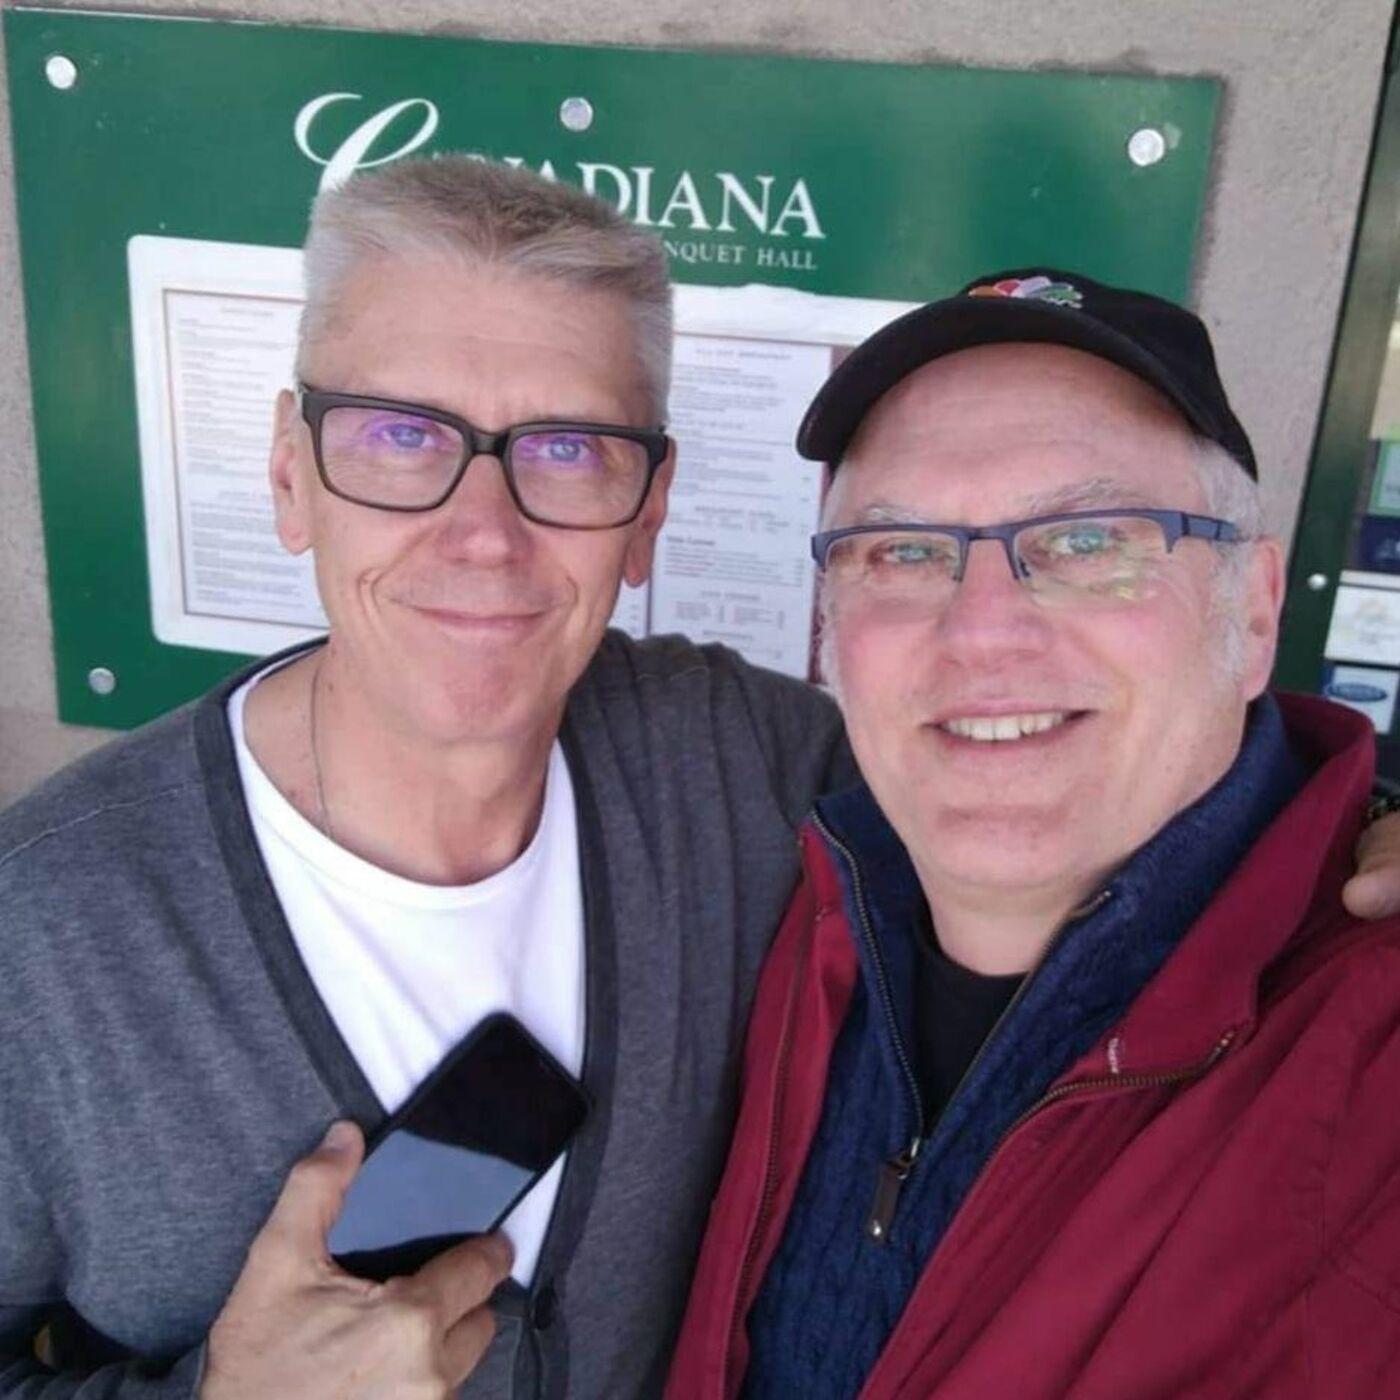 Episode 8: New Life Casting director Jon Comerford